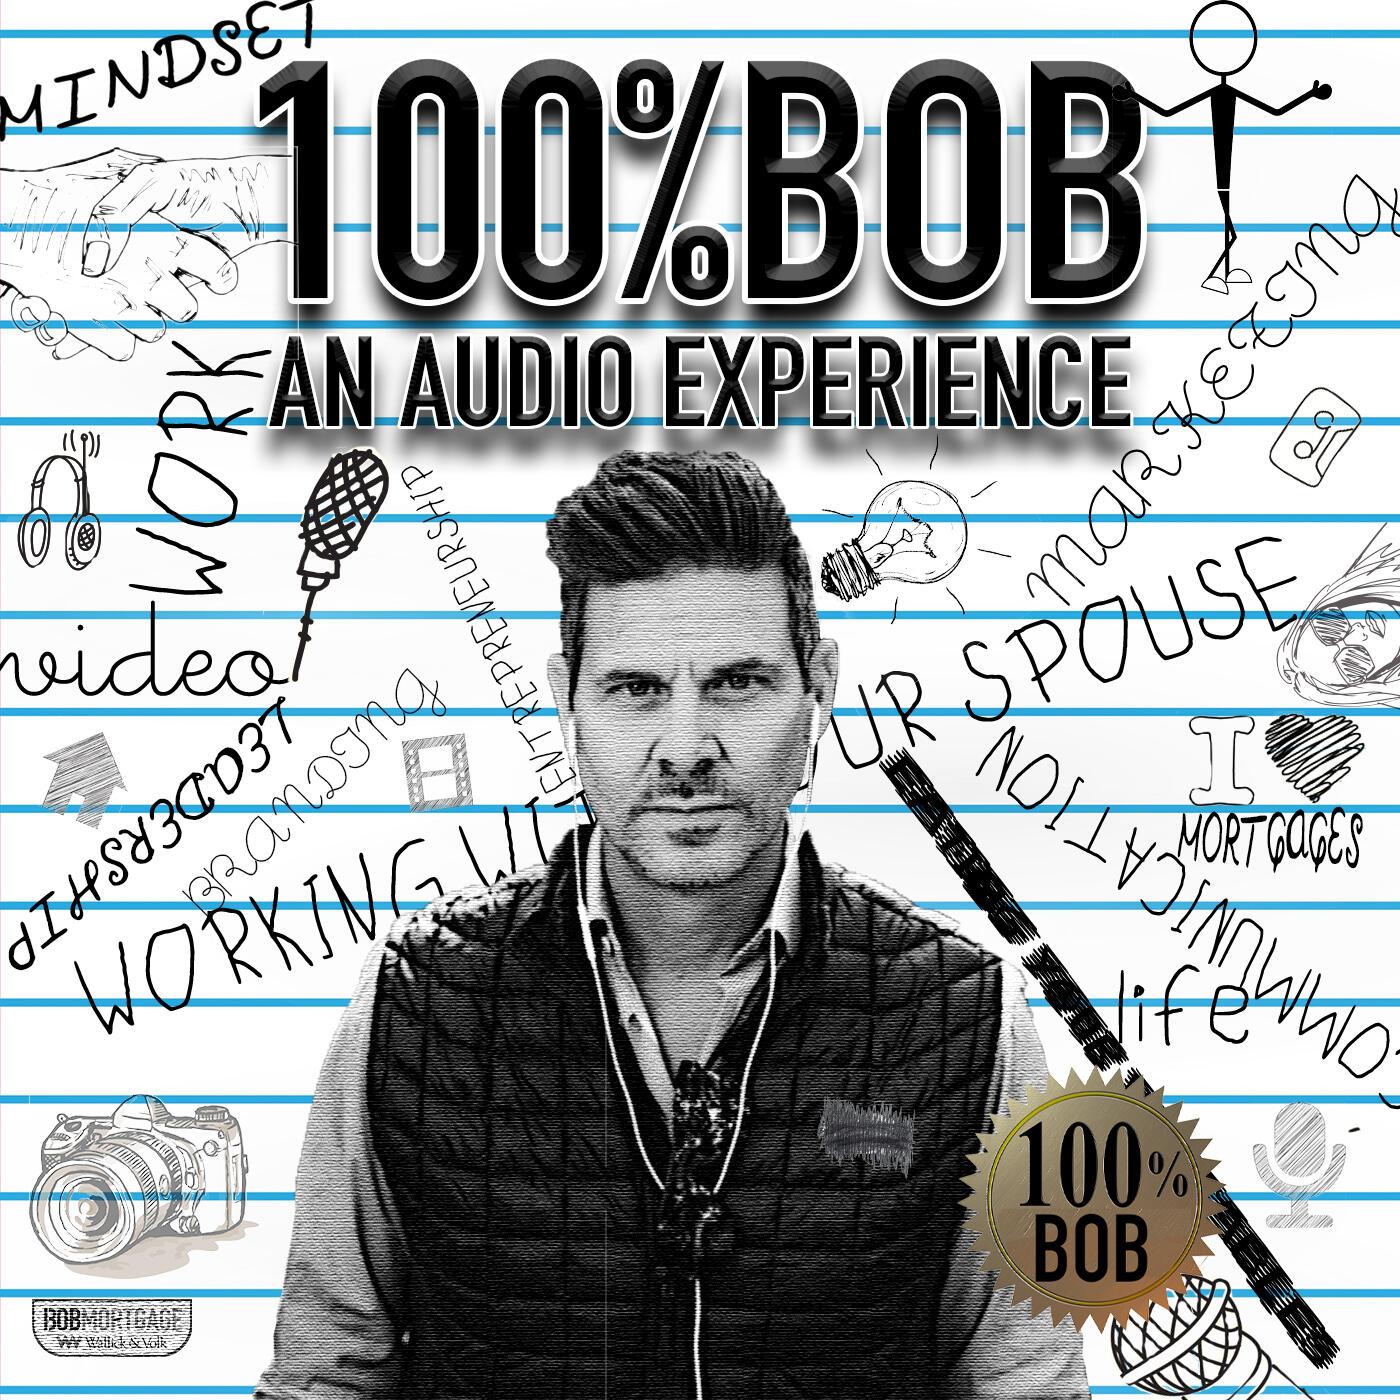 100%Bob: An Audio Experience